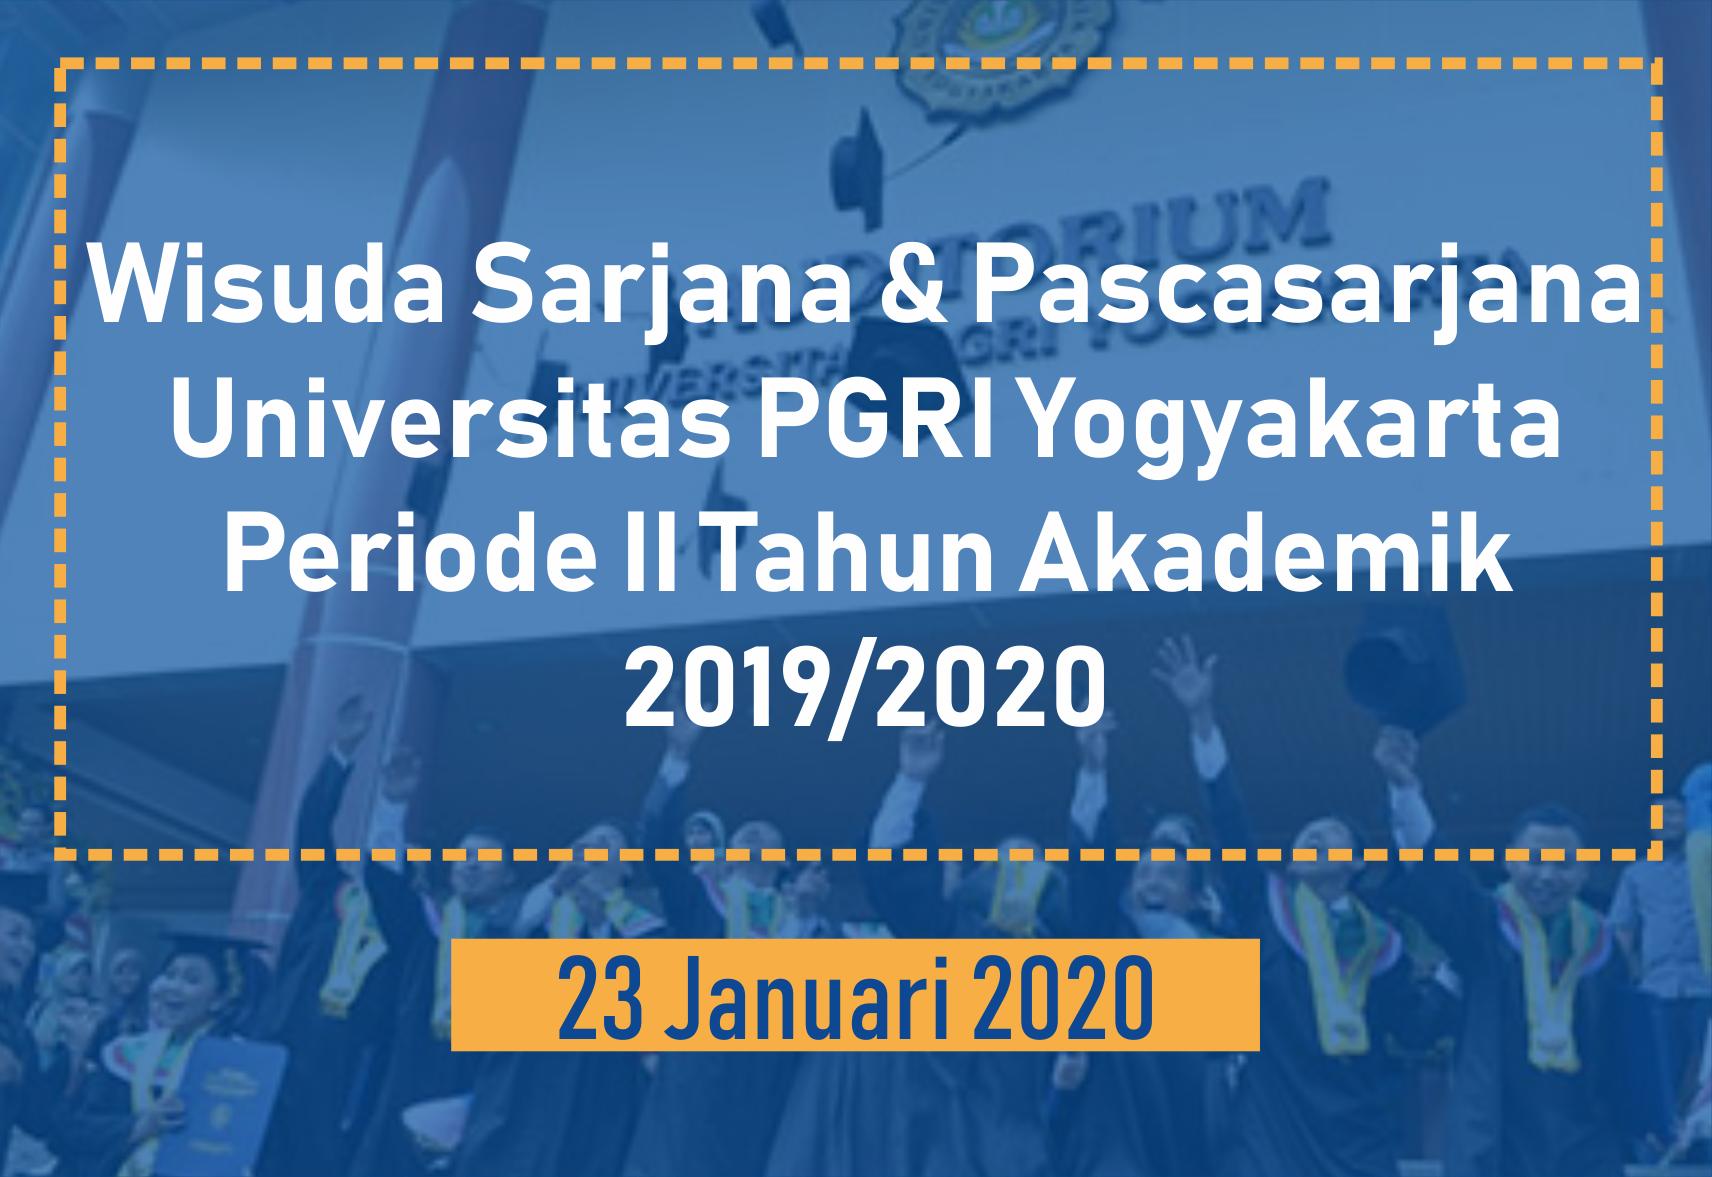 Wisuda Sarjana & Pascasarjana Universitas PGRI Yogyakarta Periode II Tahun Akademik 2019/2020